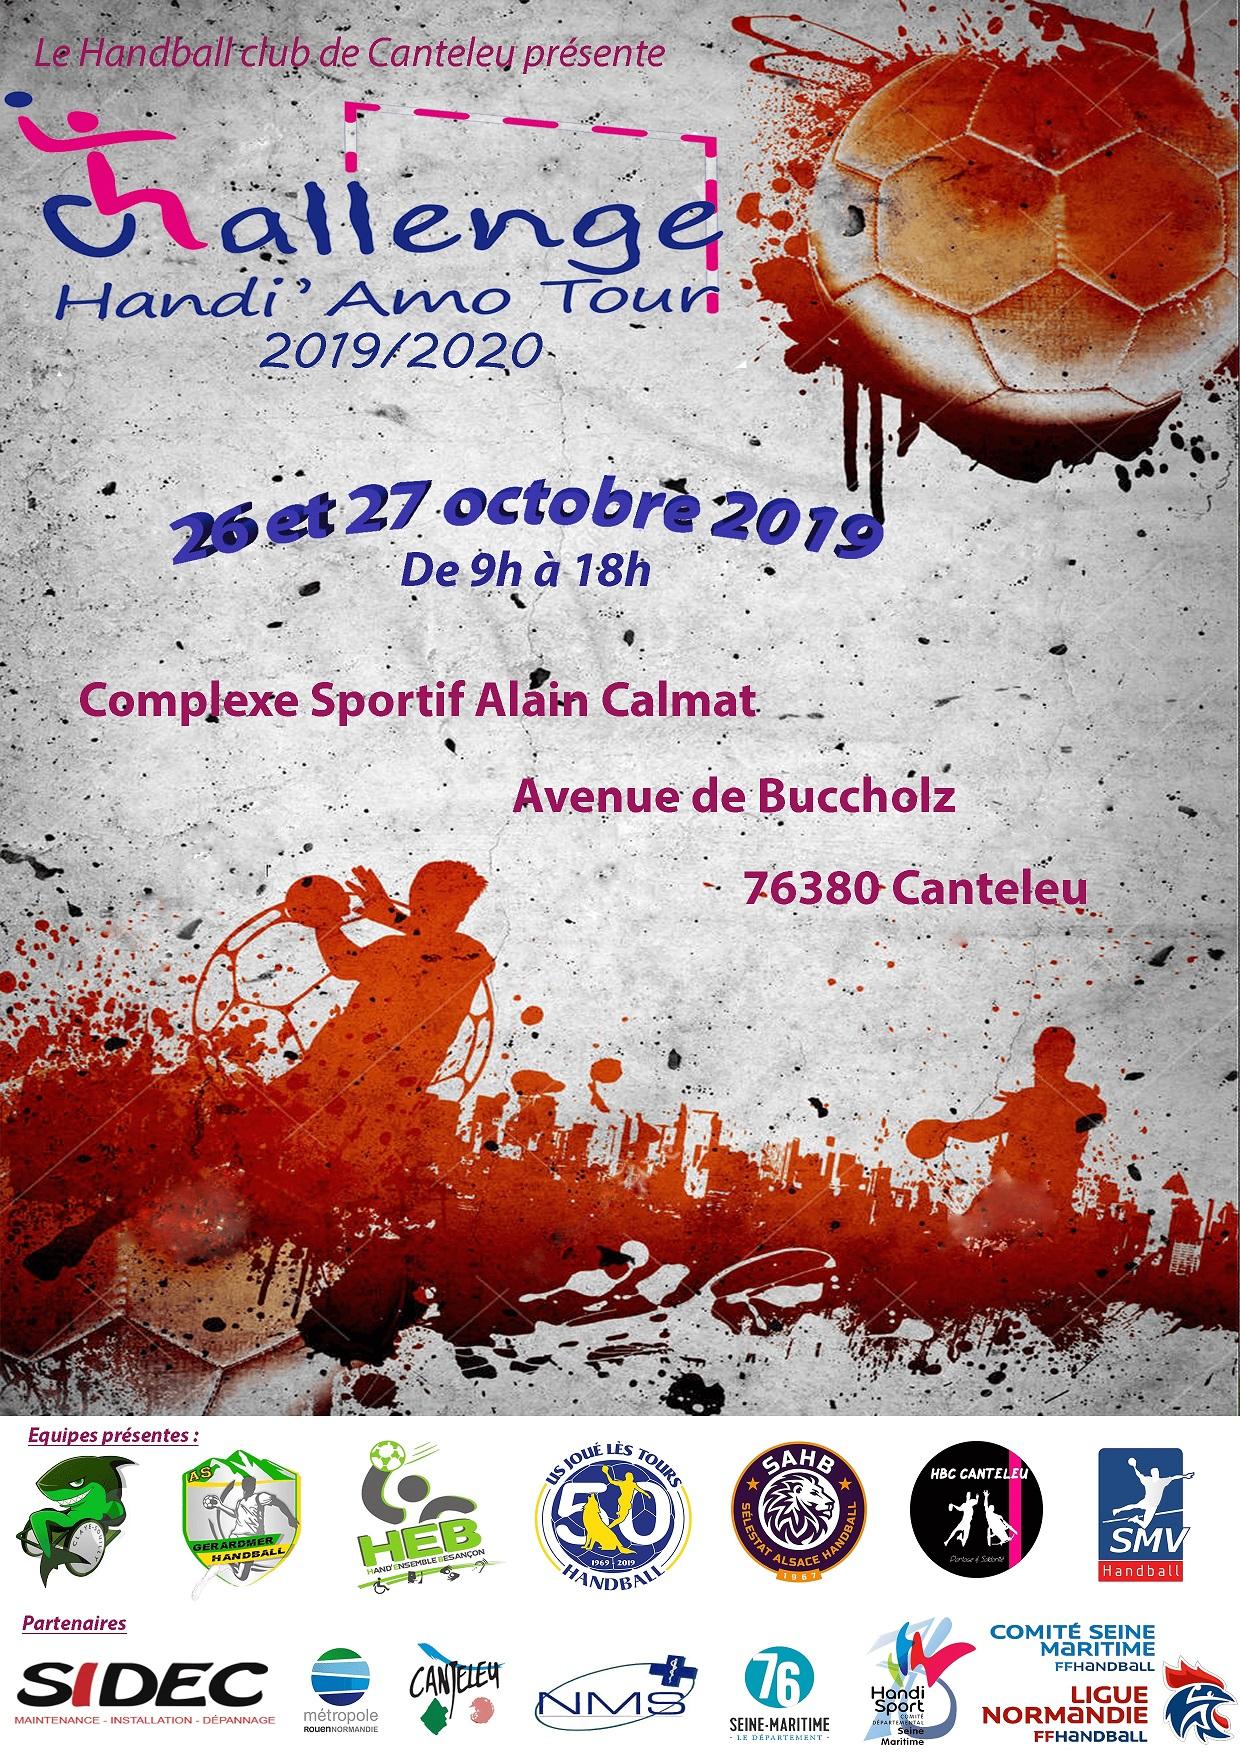 affiche Tournoi hand Ball 26 et 27 octobre 2019